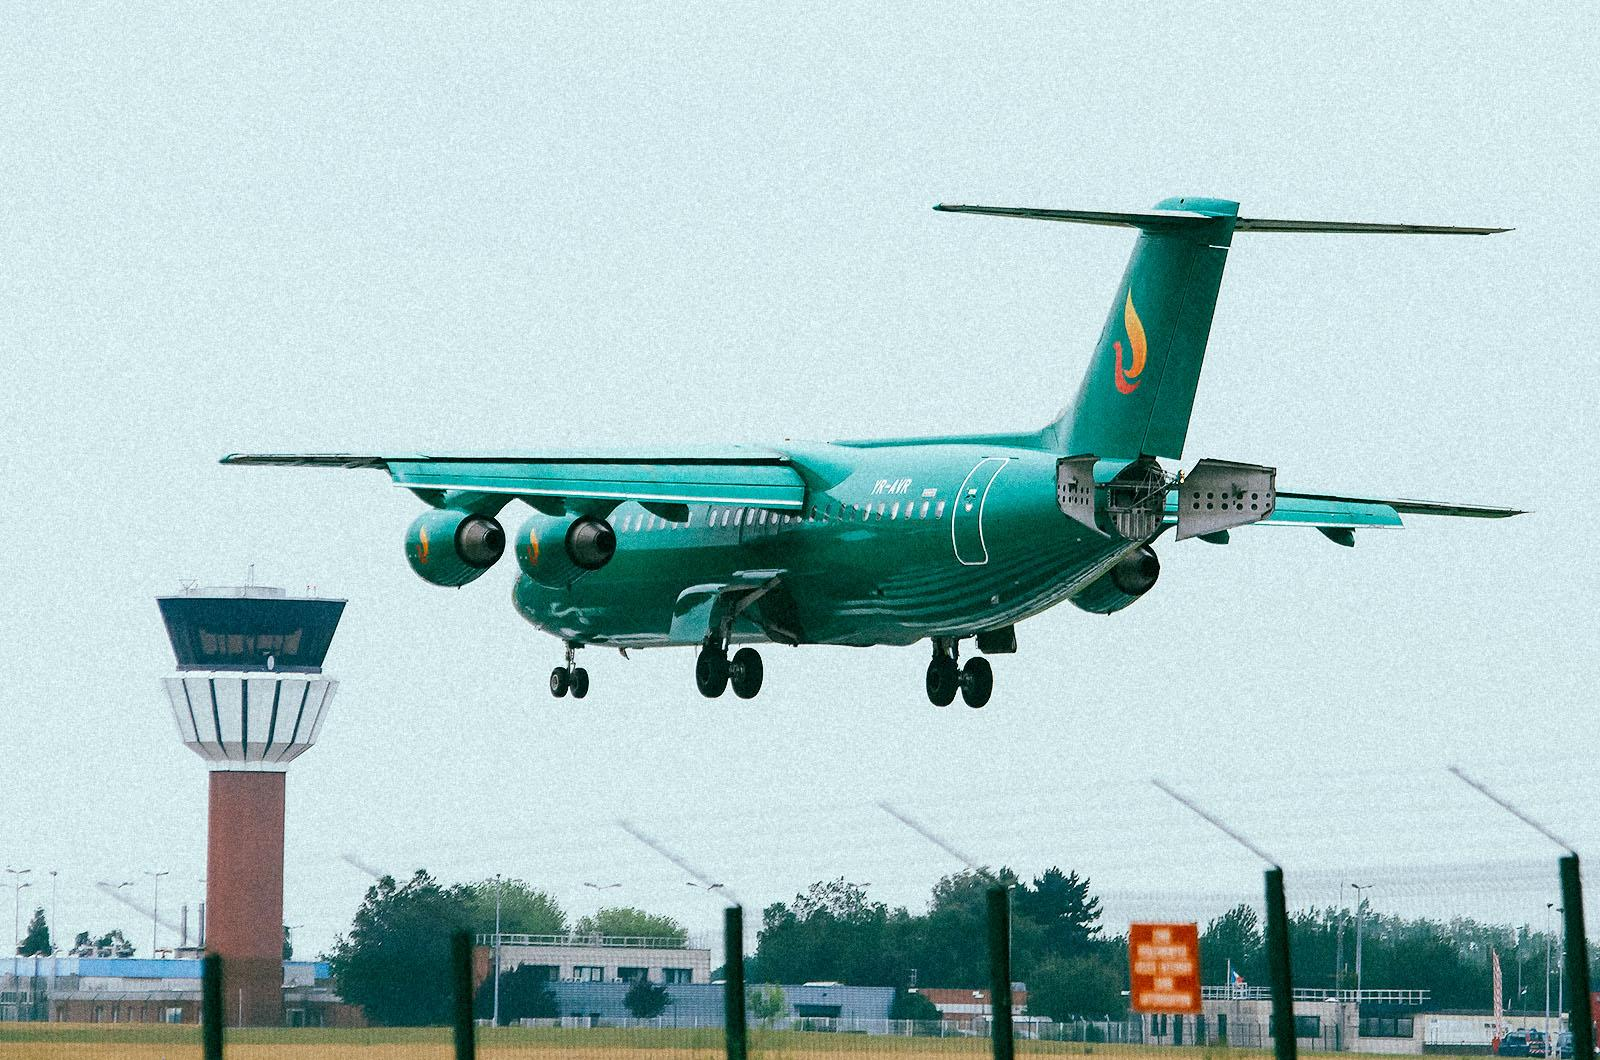 L'avion vert, un mirage